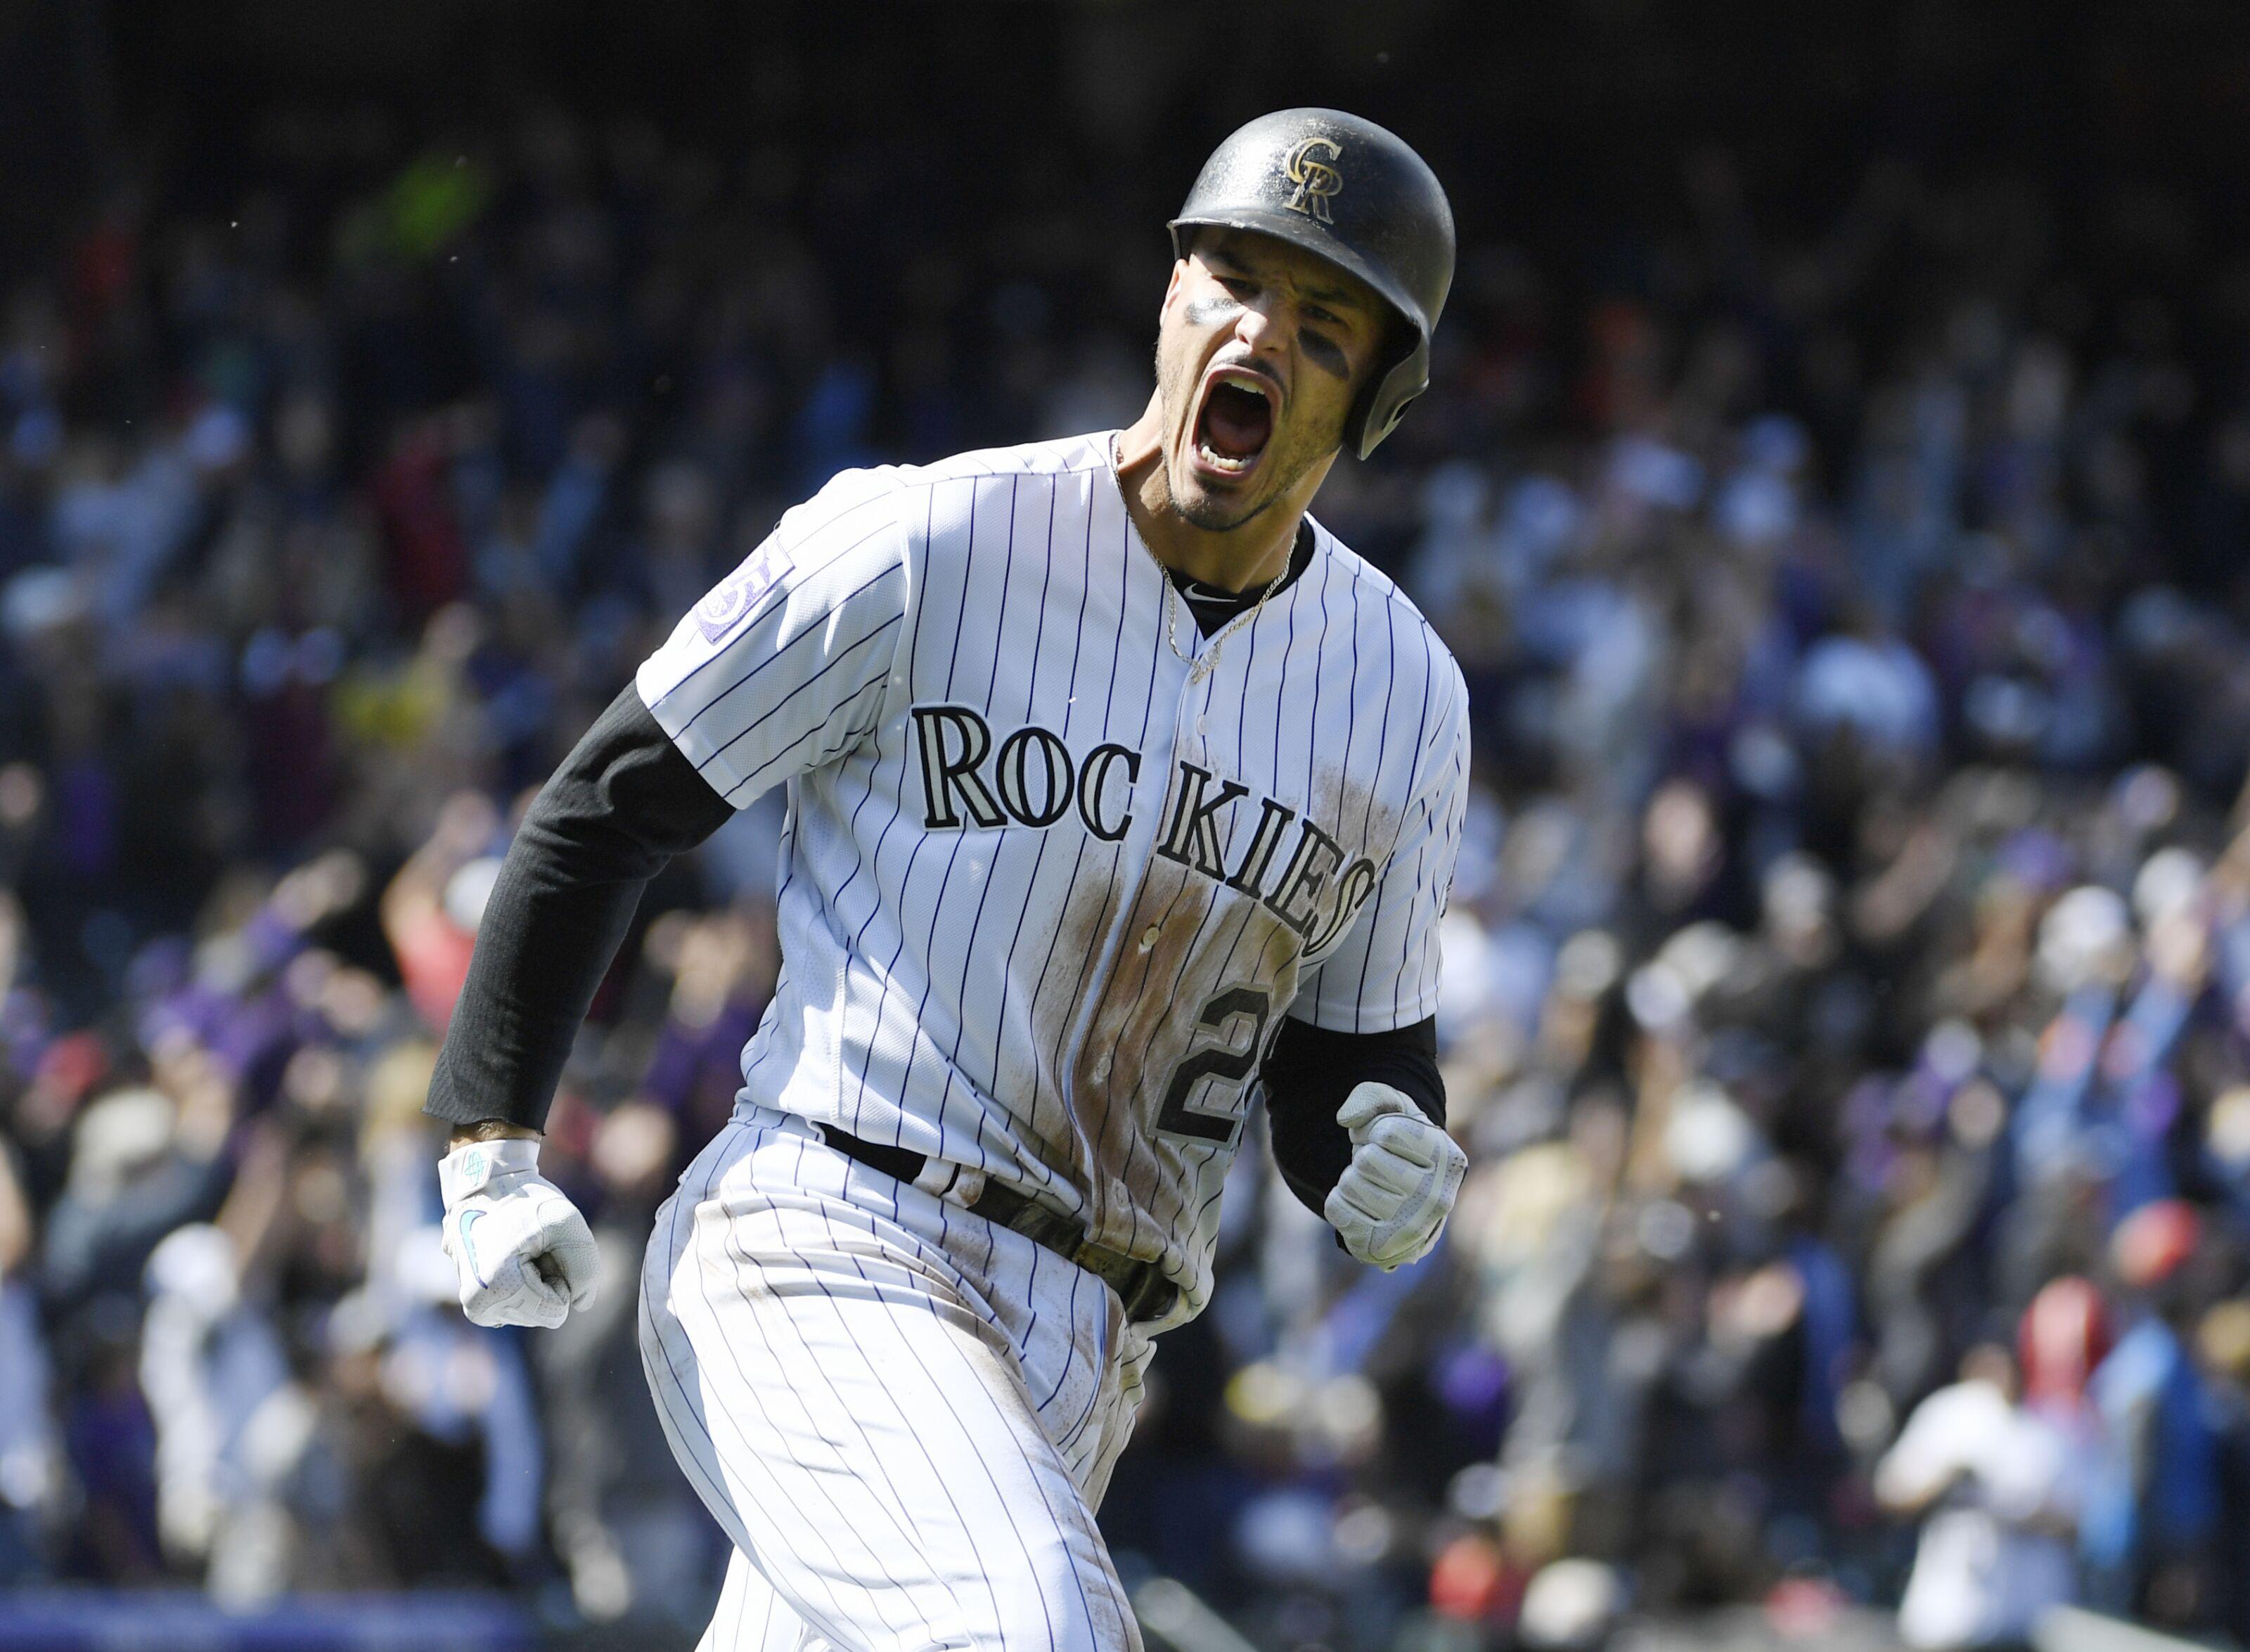 Fantasy Baseball: Top 10 Third Baseman for 2019